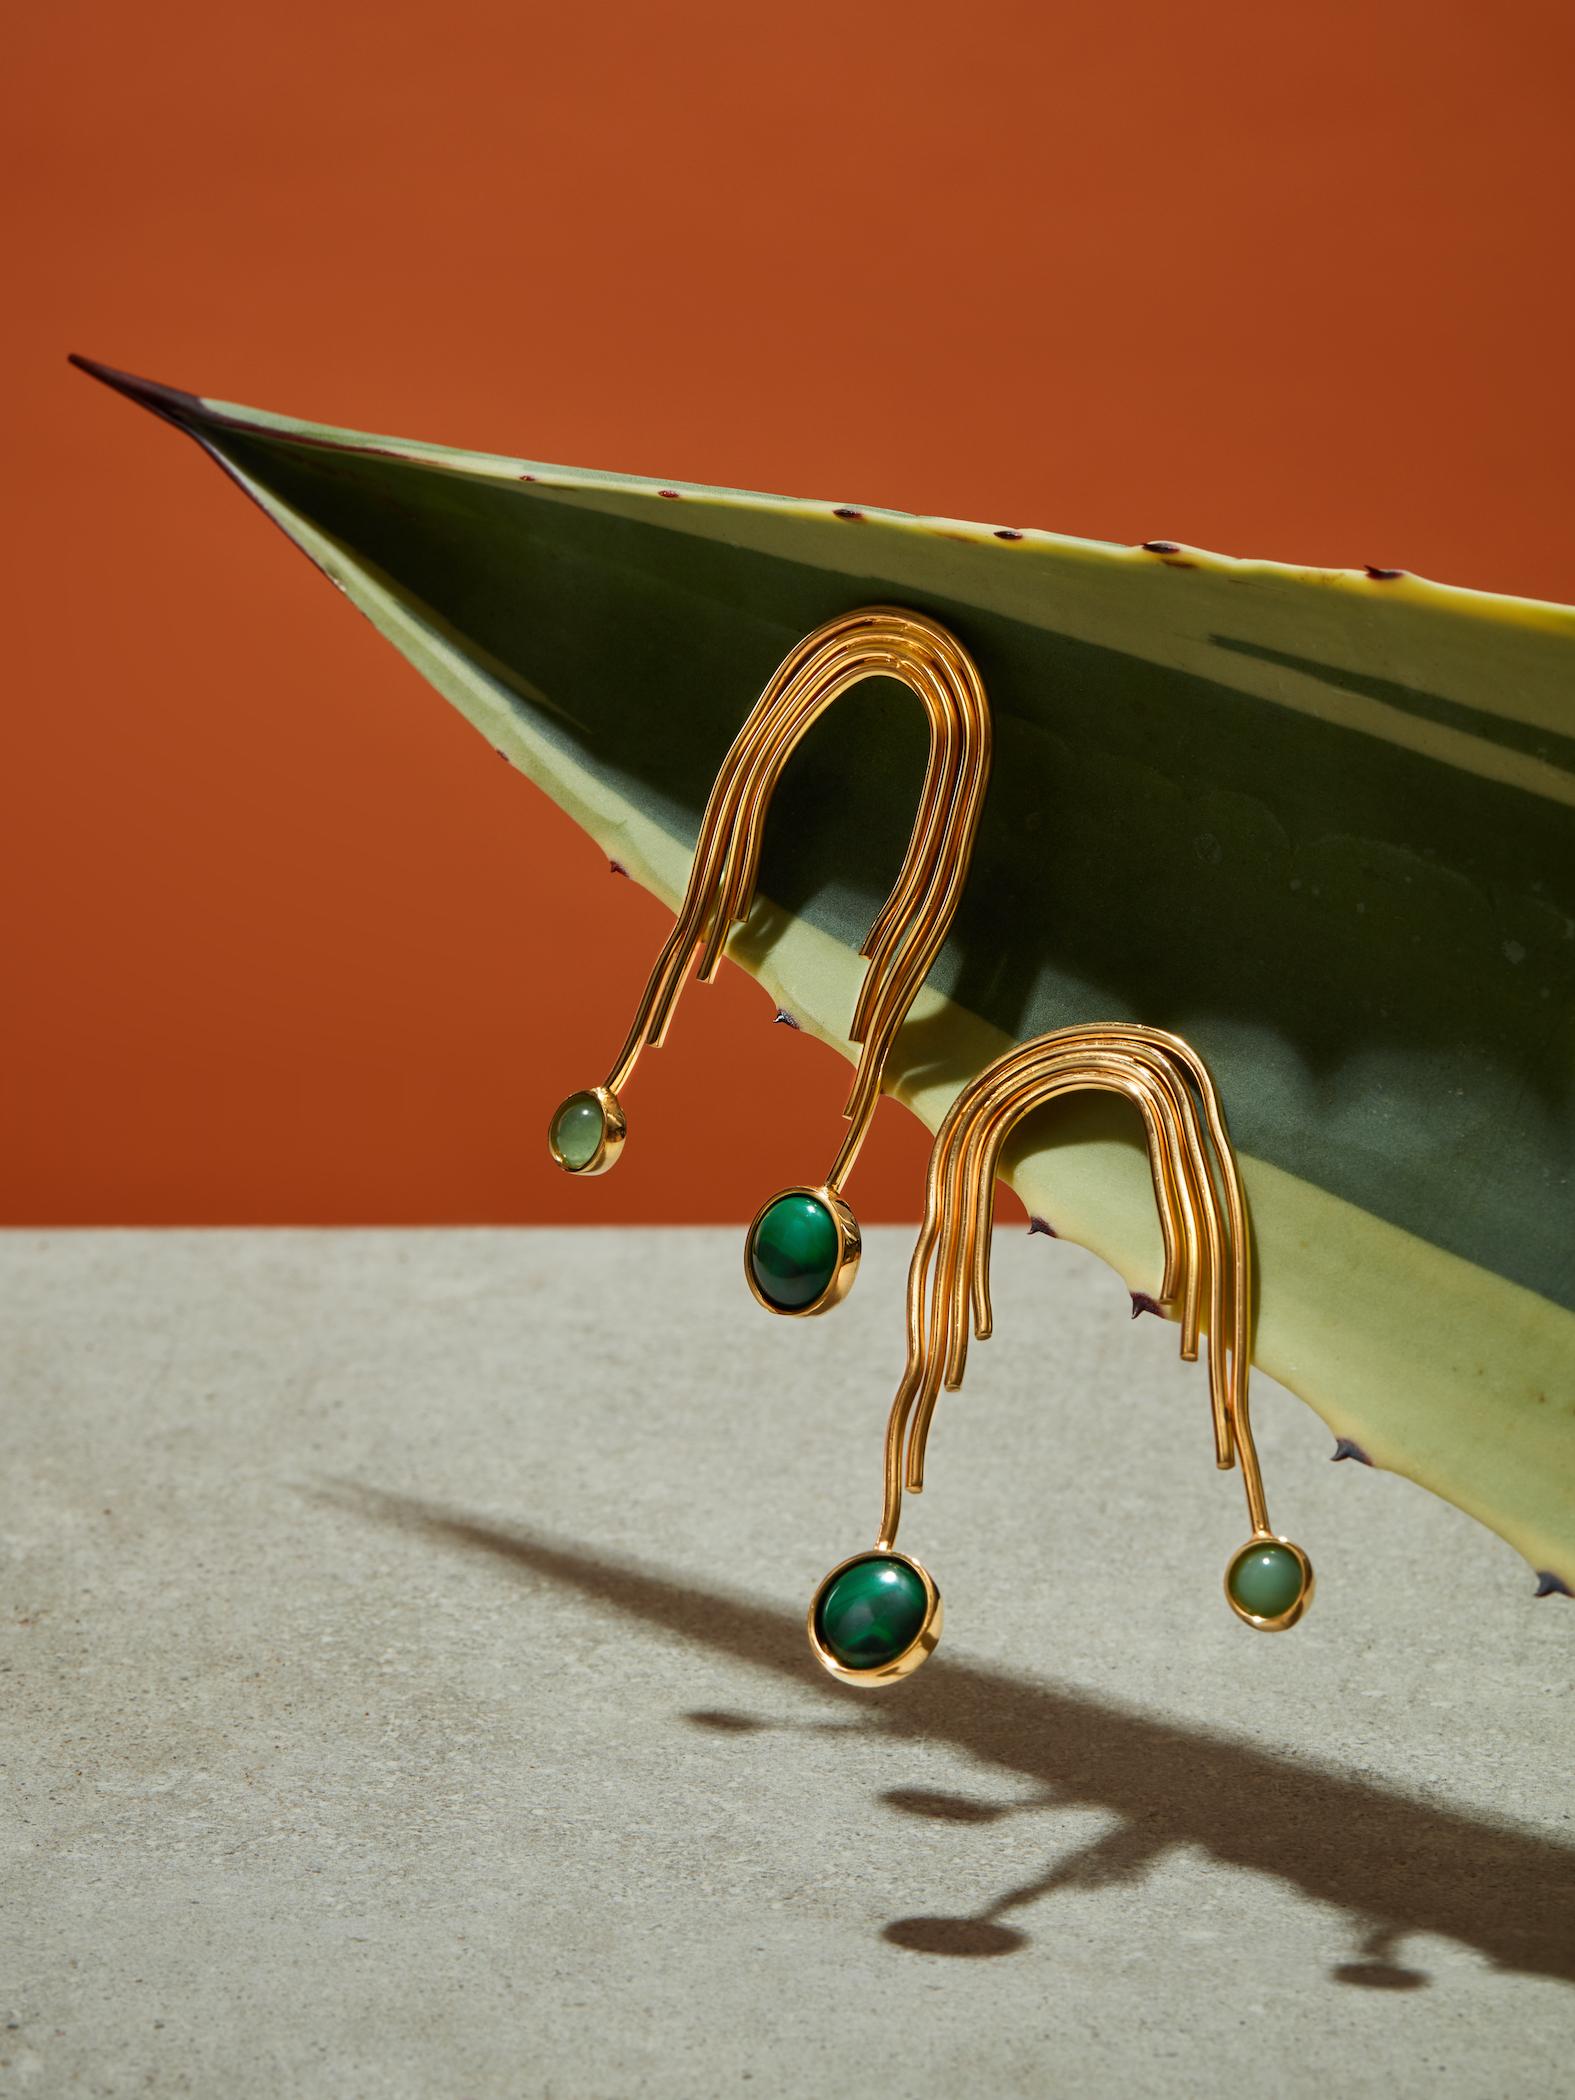 Cascada Malachite and Jade Earrings by Jill Hopkins Jewellery on curated-crowd.com